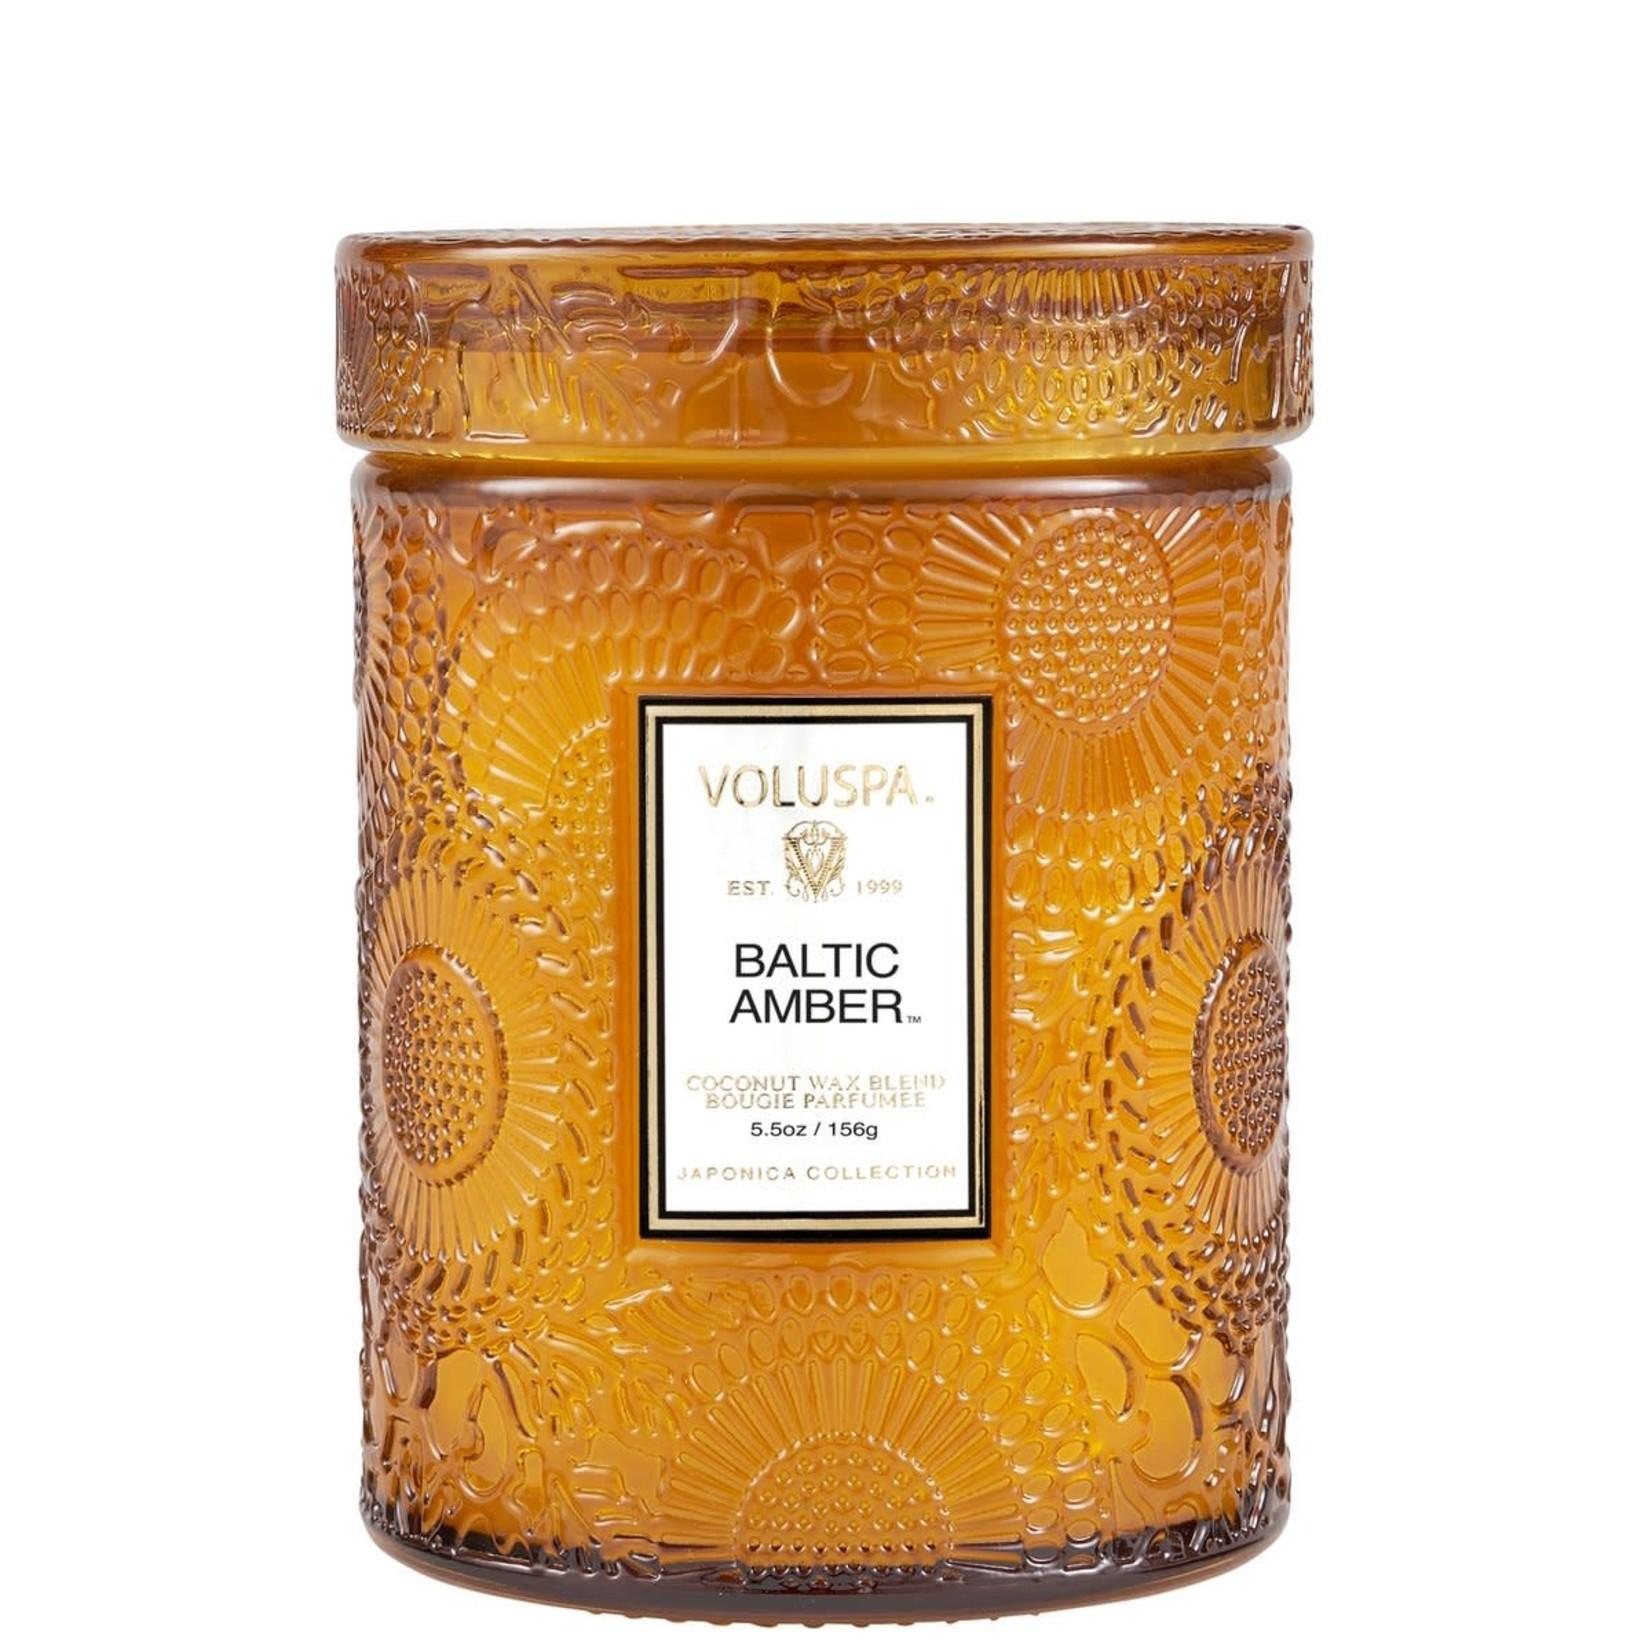 Voluspa Baltic Amber Small Jar Candle